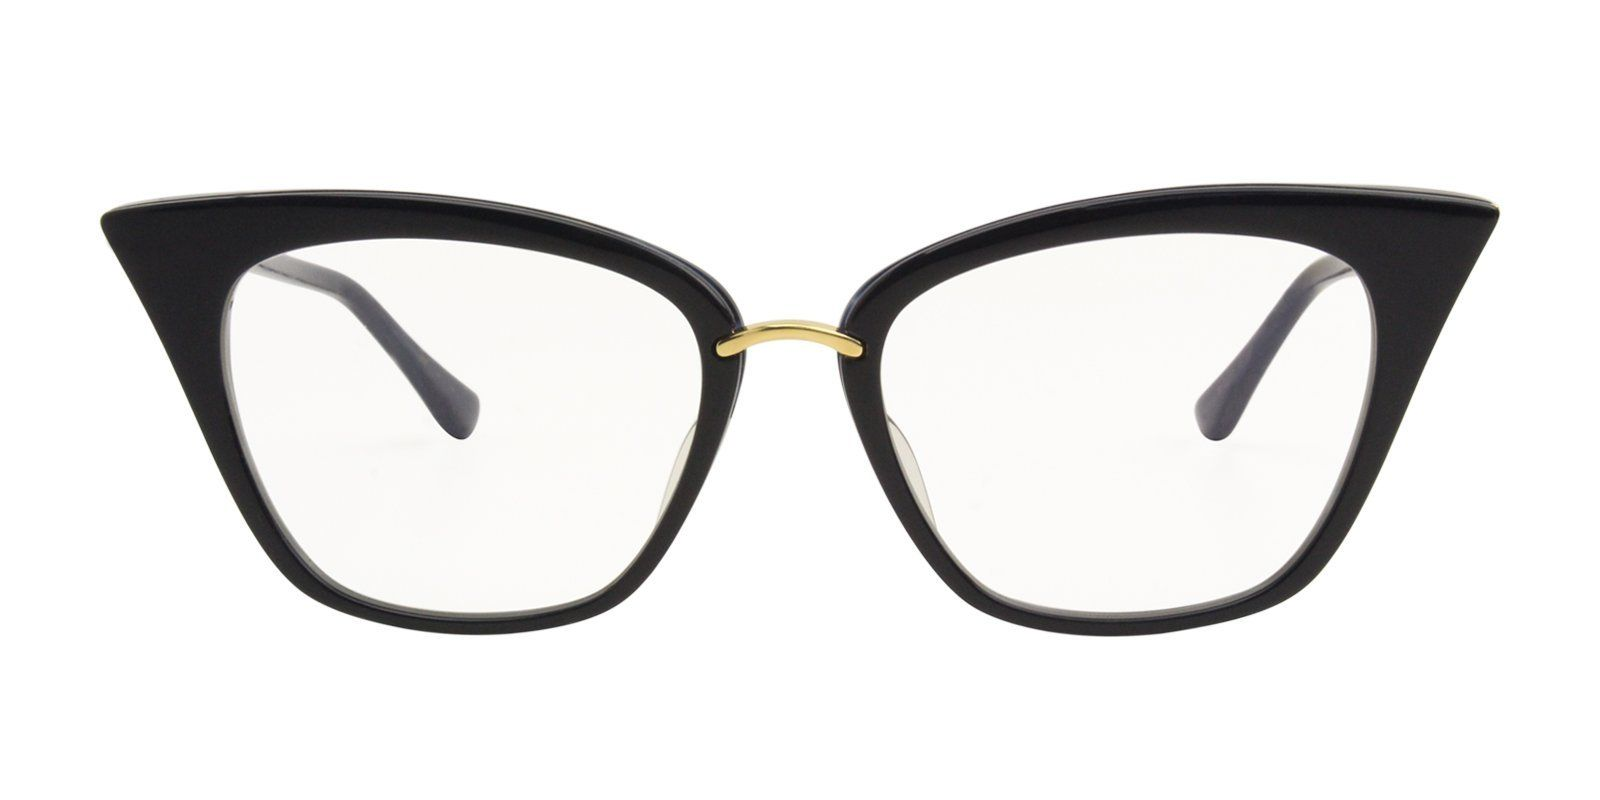 c0f5dd682b7f Dita - Rebella Blue-eyeglasses-Designer Eyes Gifts For Women